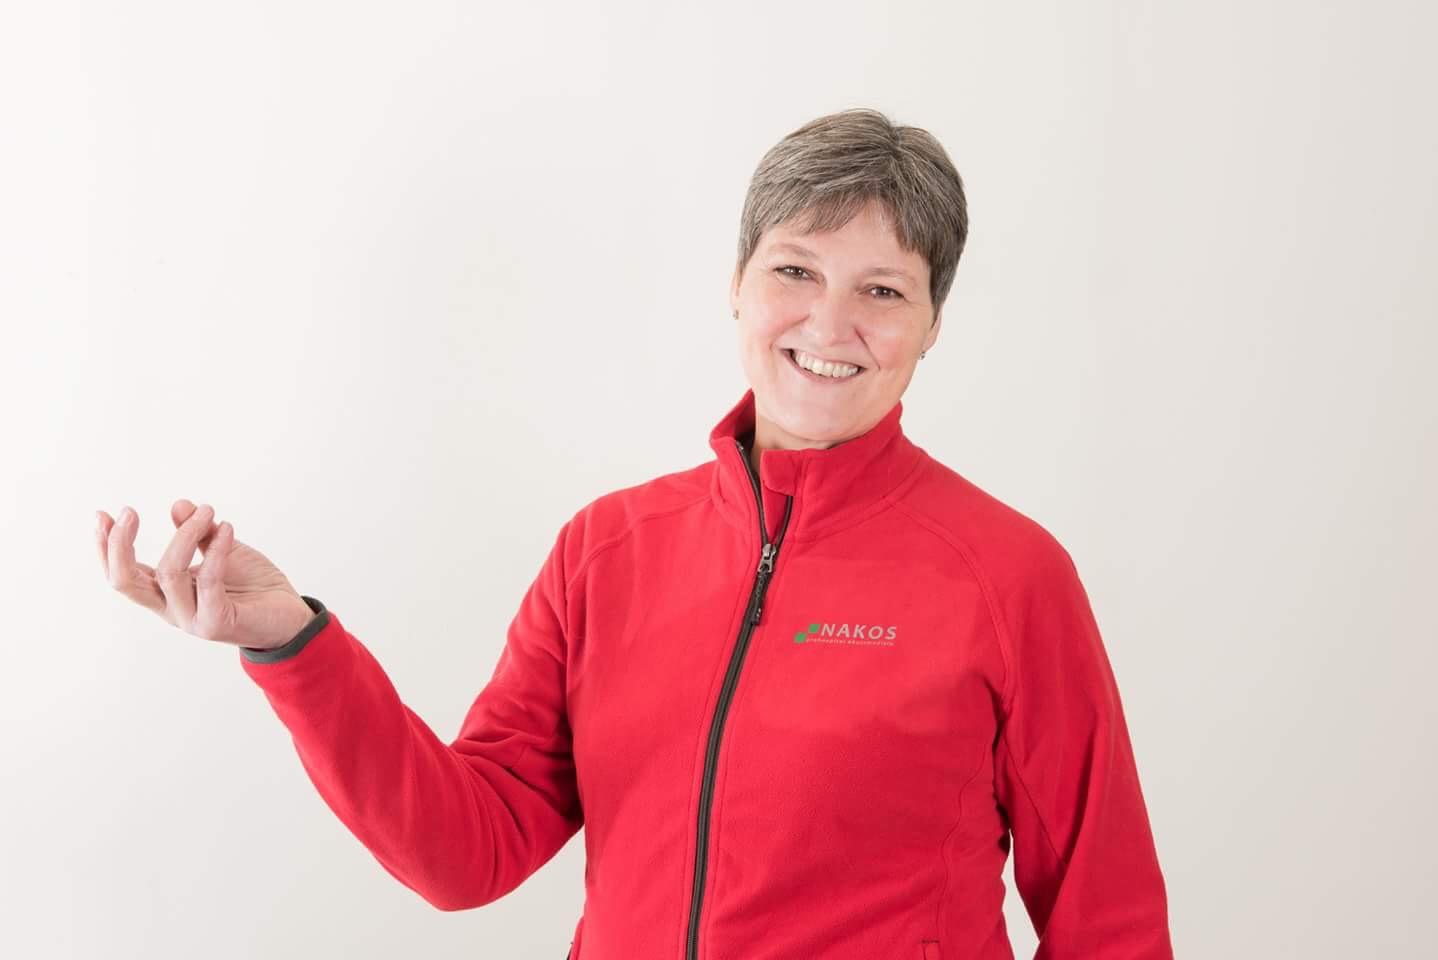 Prosjektleder Siw Lilly Osmundsen